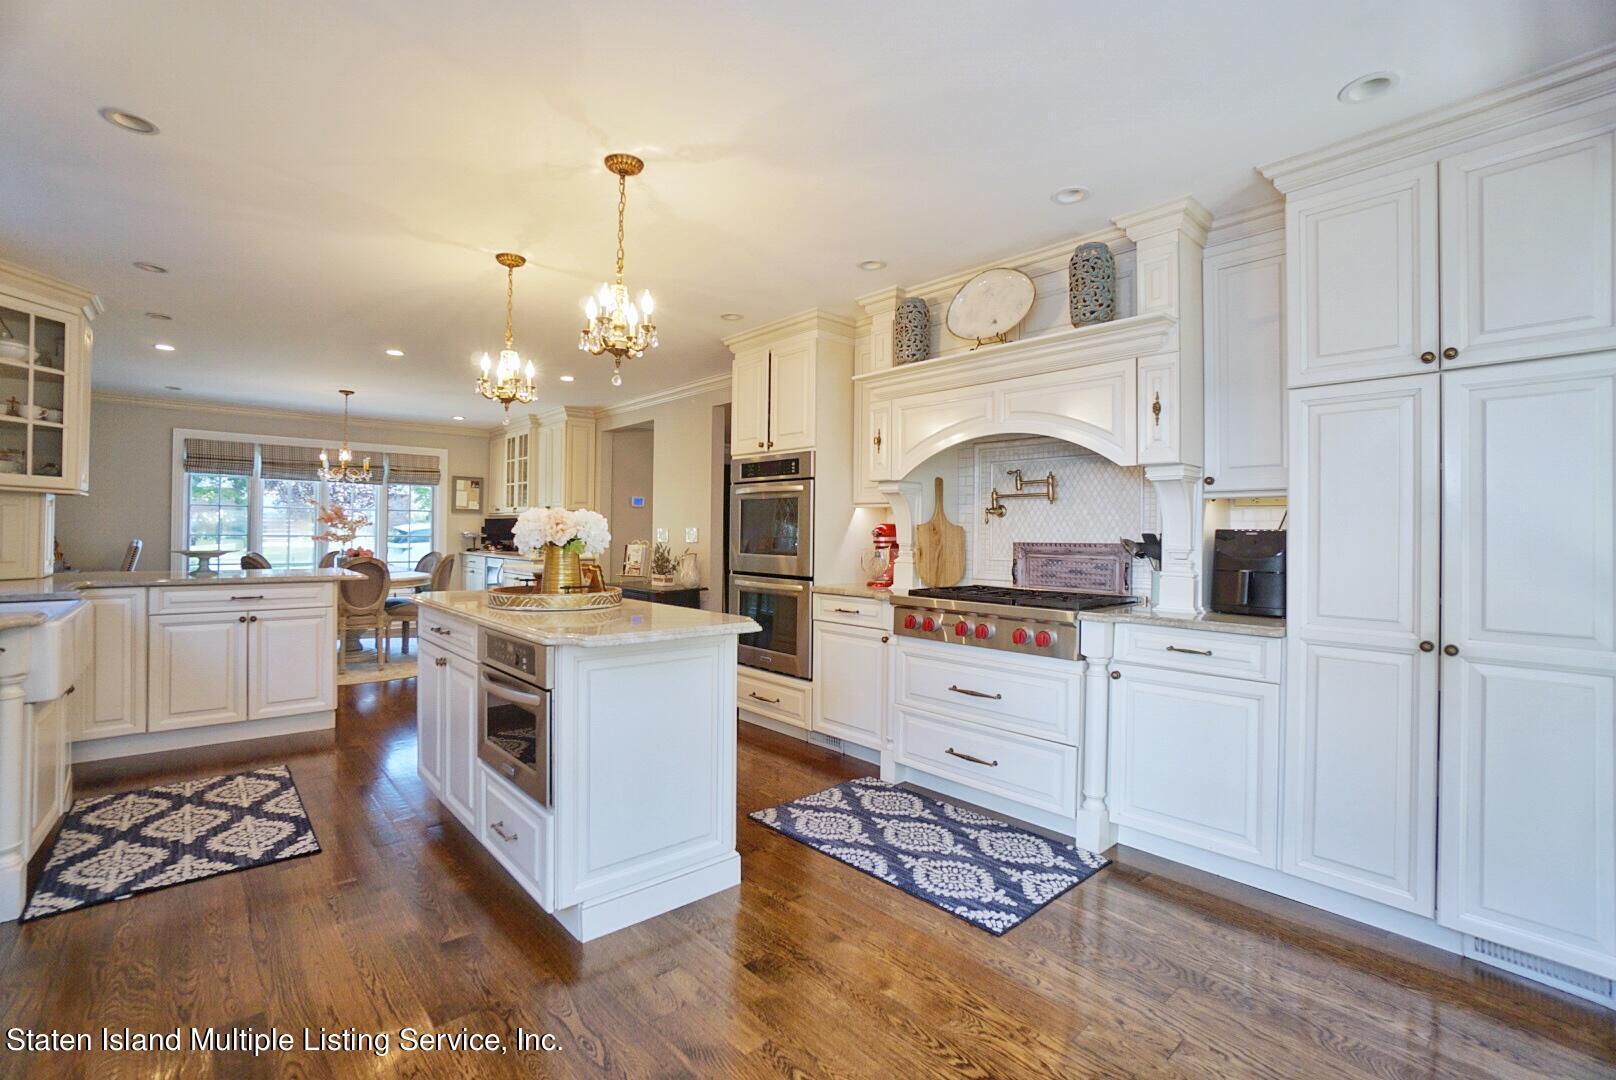 Single Family - Detached 116 Fine Blvd   Staten Island, NY 10314, MLS-1148291-23